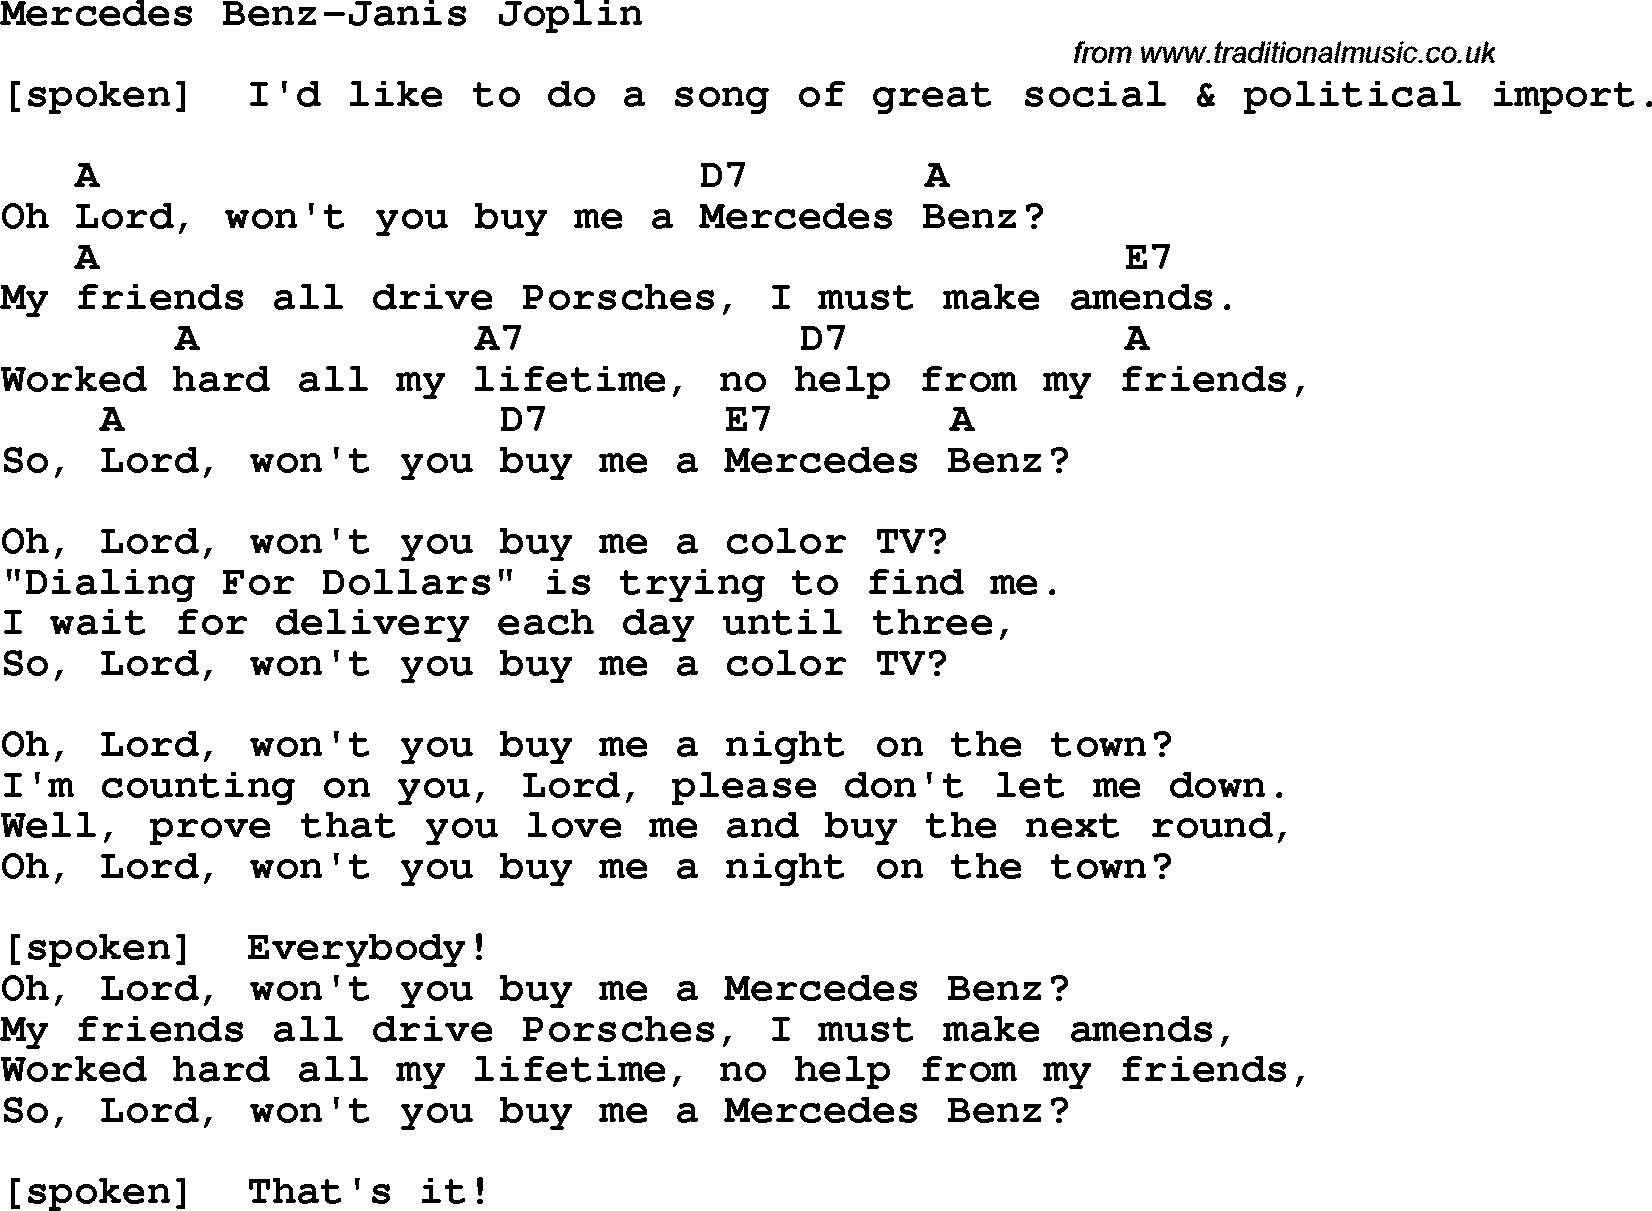 Protest Song Mercedes Benz Janis Joplin Lyrics And Chords